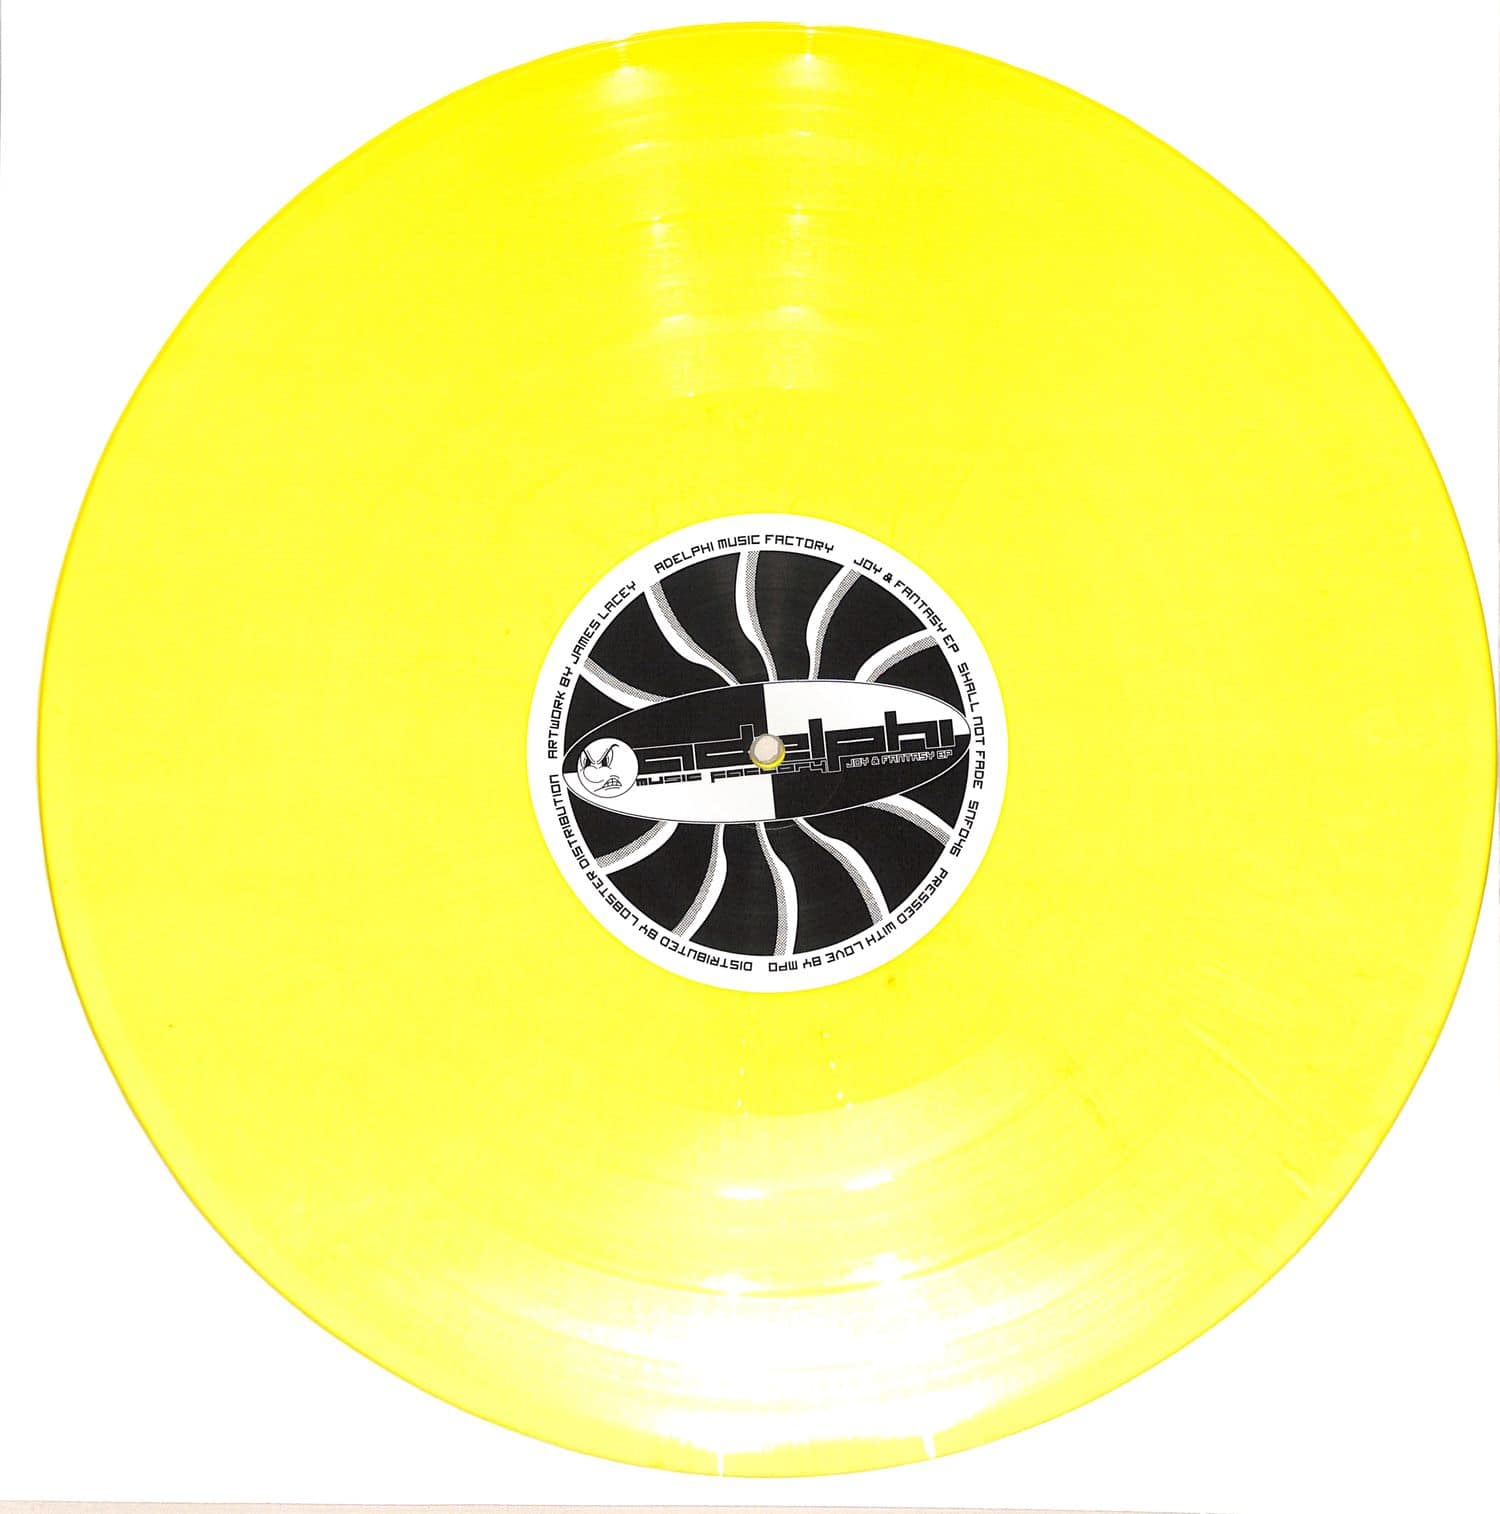 Adelphi Music Factory - JOY AND FANTASY EP